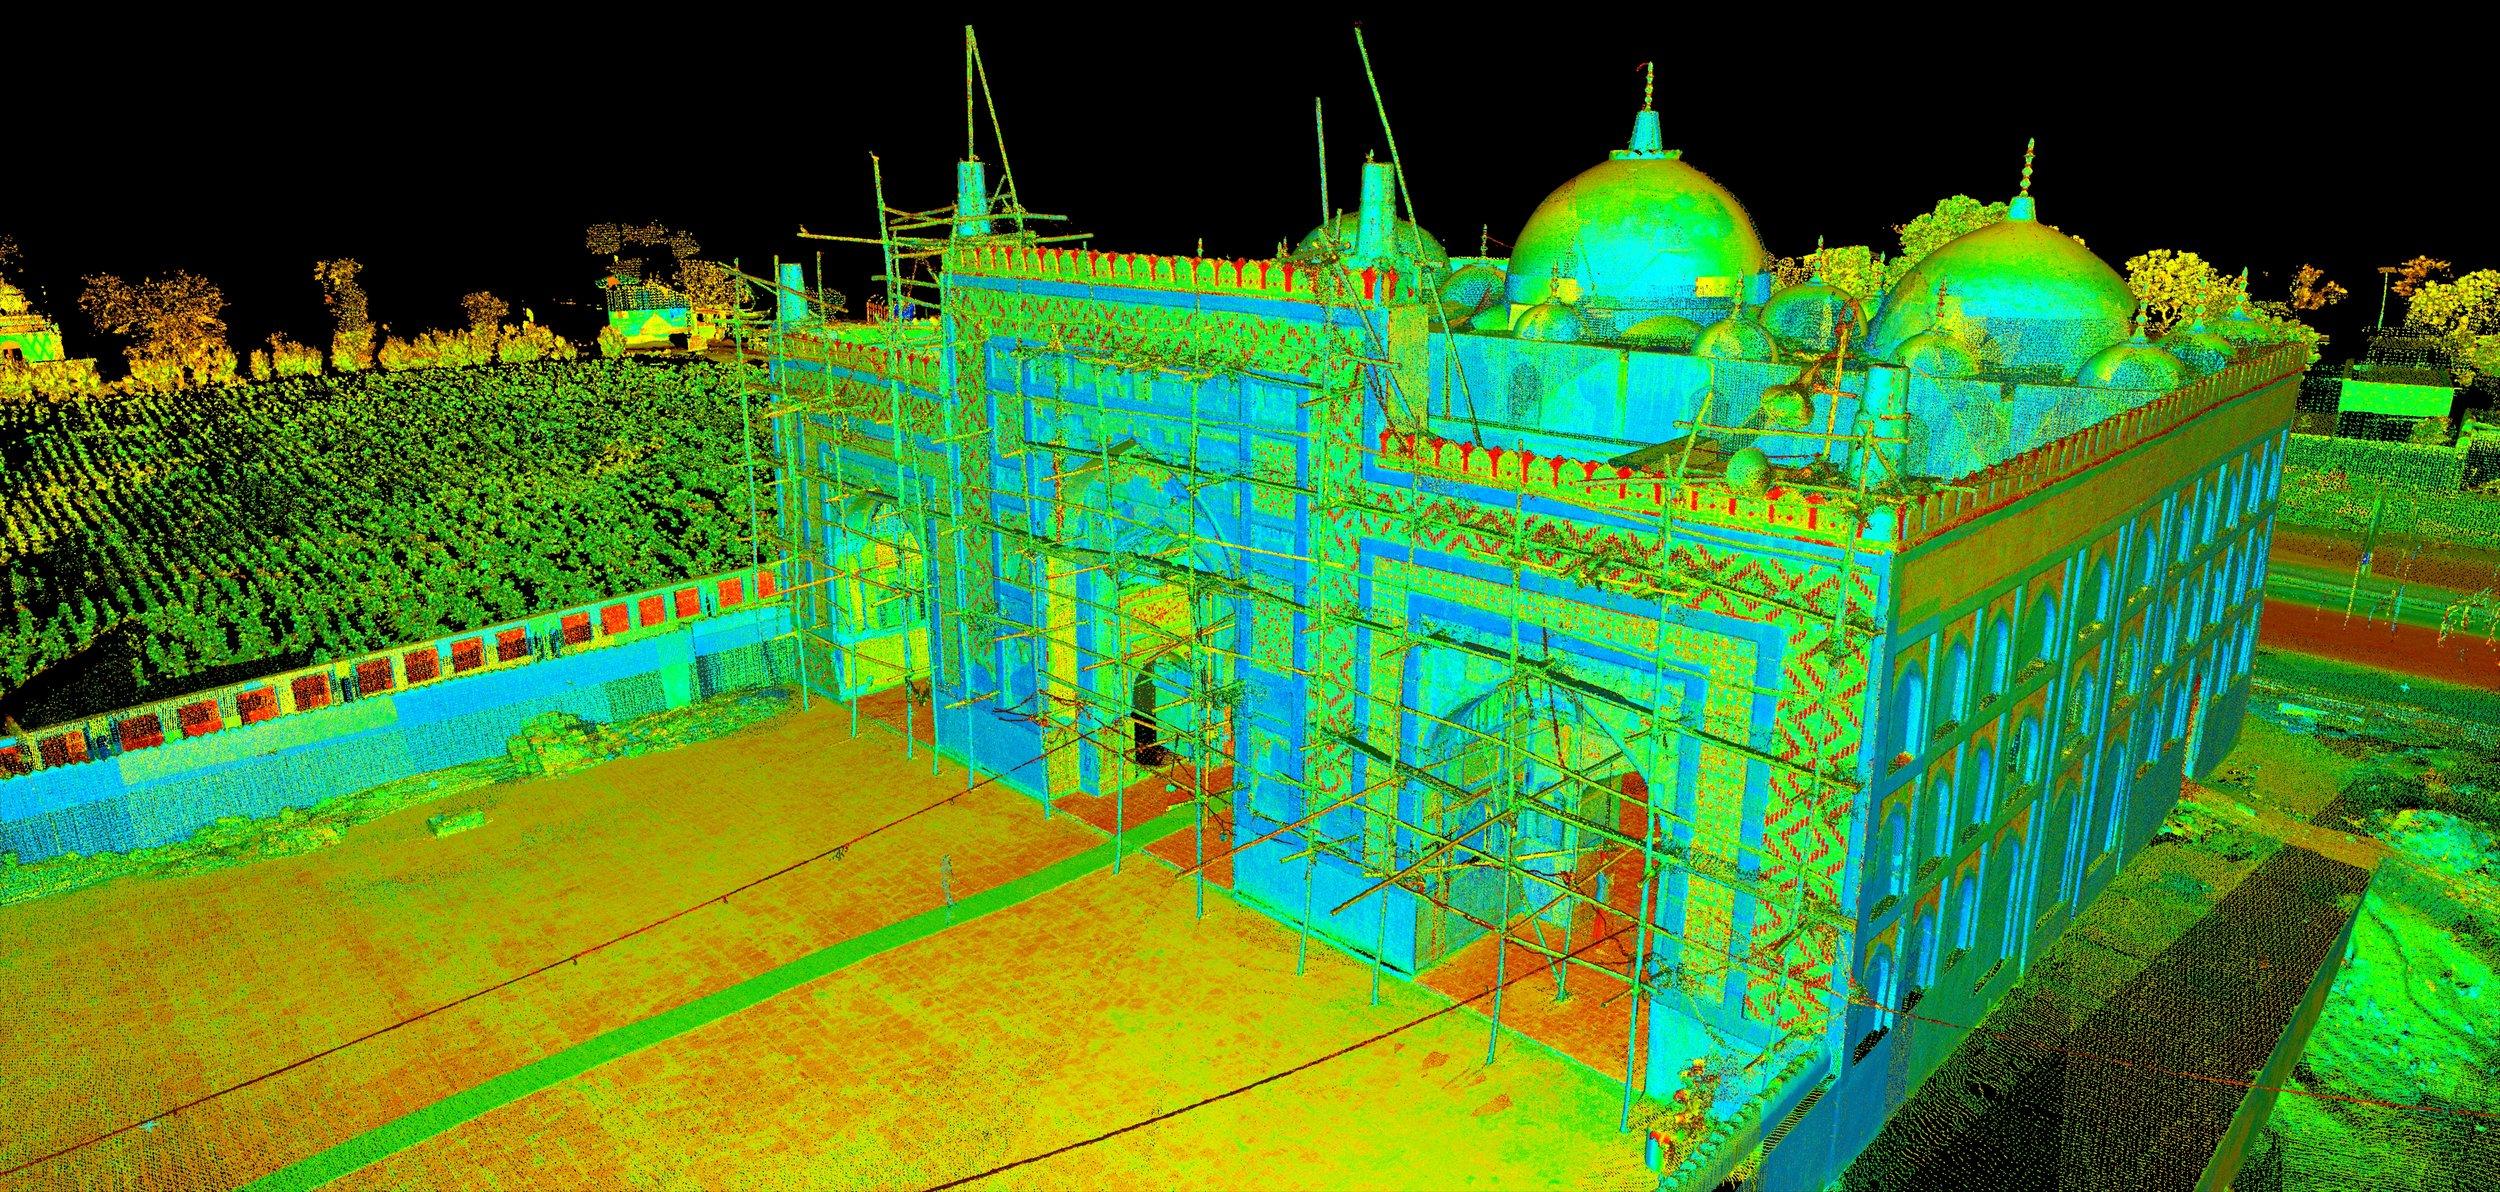 Digital Documentation of World Heritage Sites  The digital documentation and creation of educational assets of 10 world heritage sites